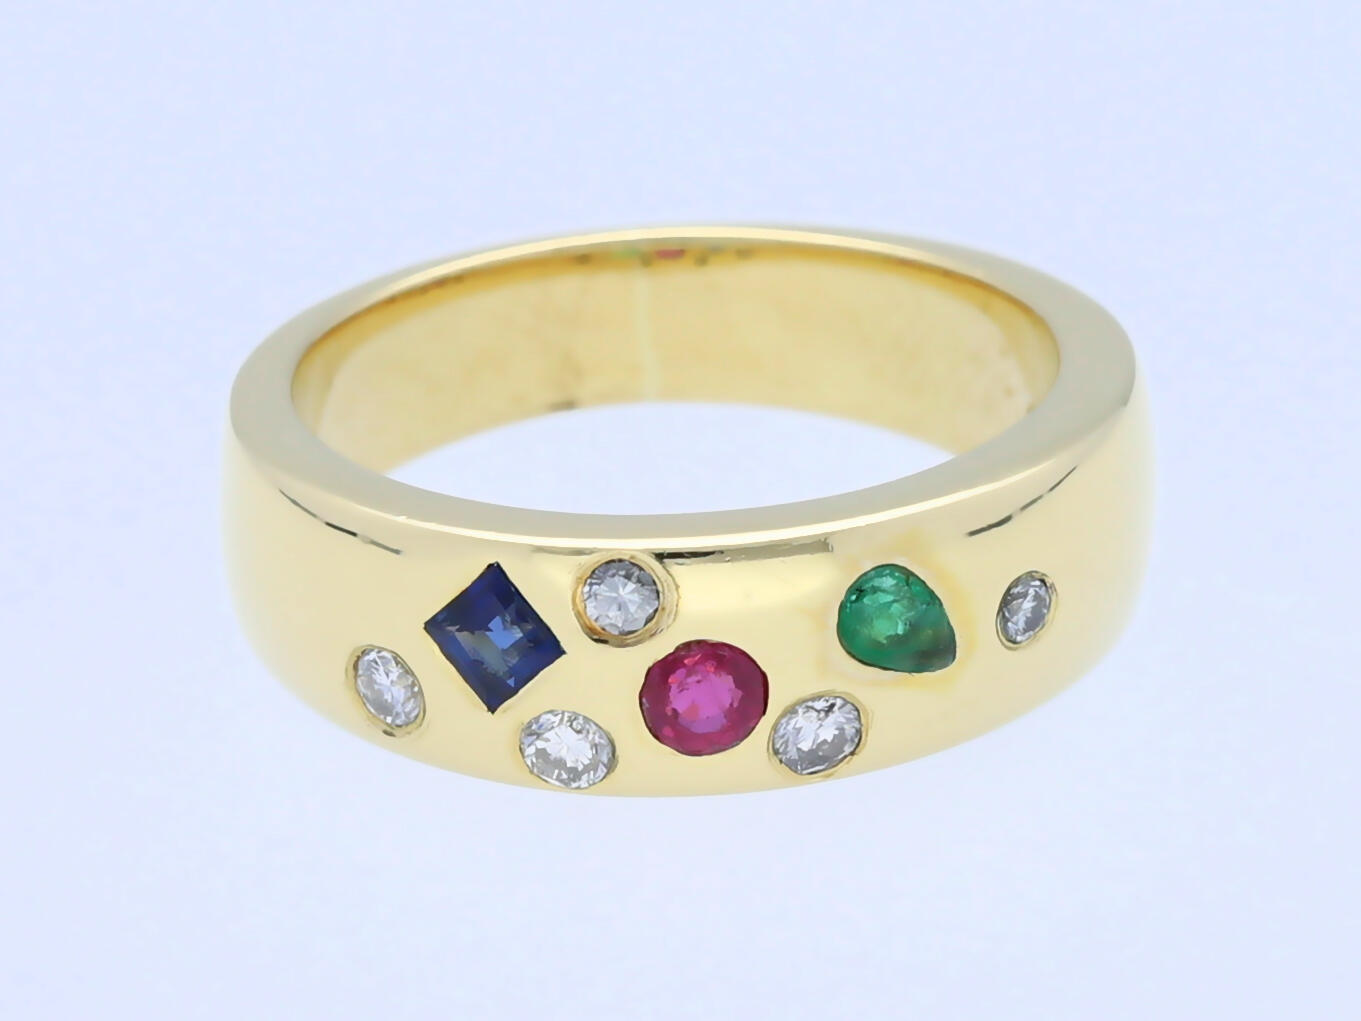 sternhimmel ring brillanten rubin saphir smaragd 750 gold wert ca eur ebay. Black Bedroom Furniture Sets. Home Design Ideas